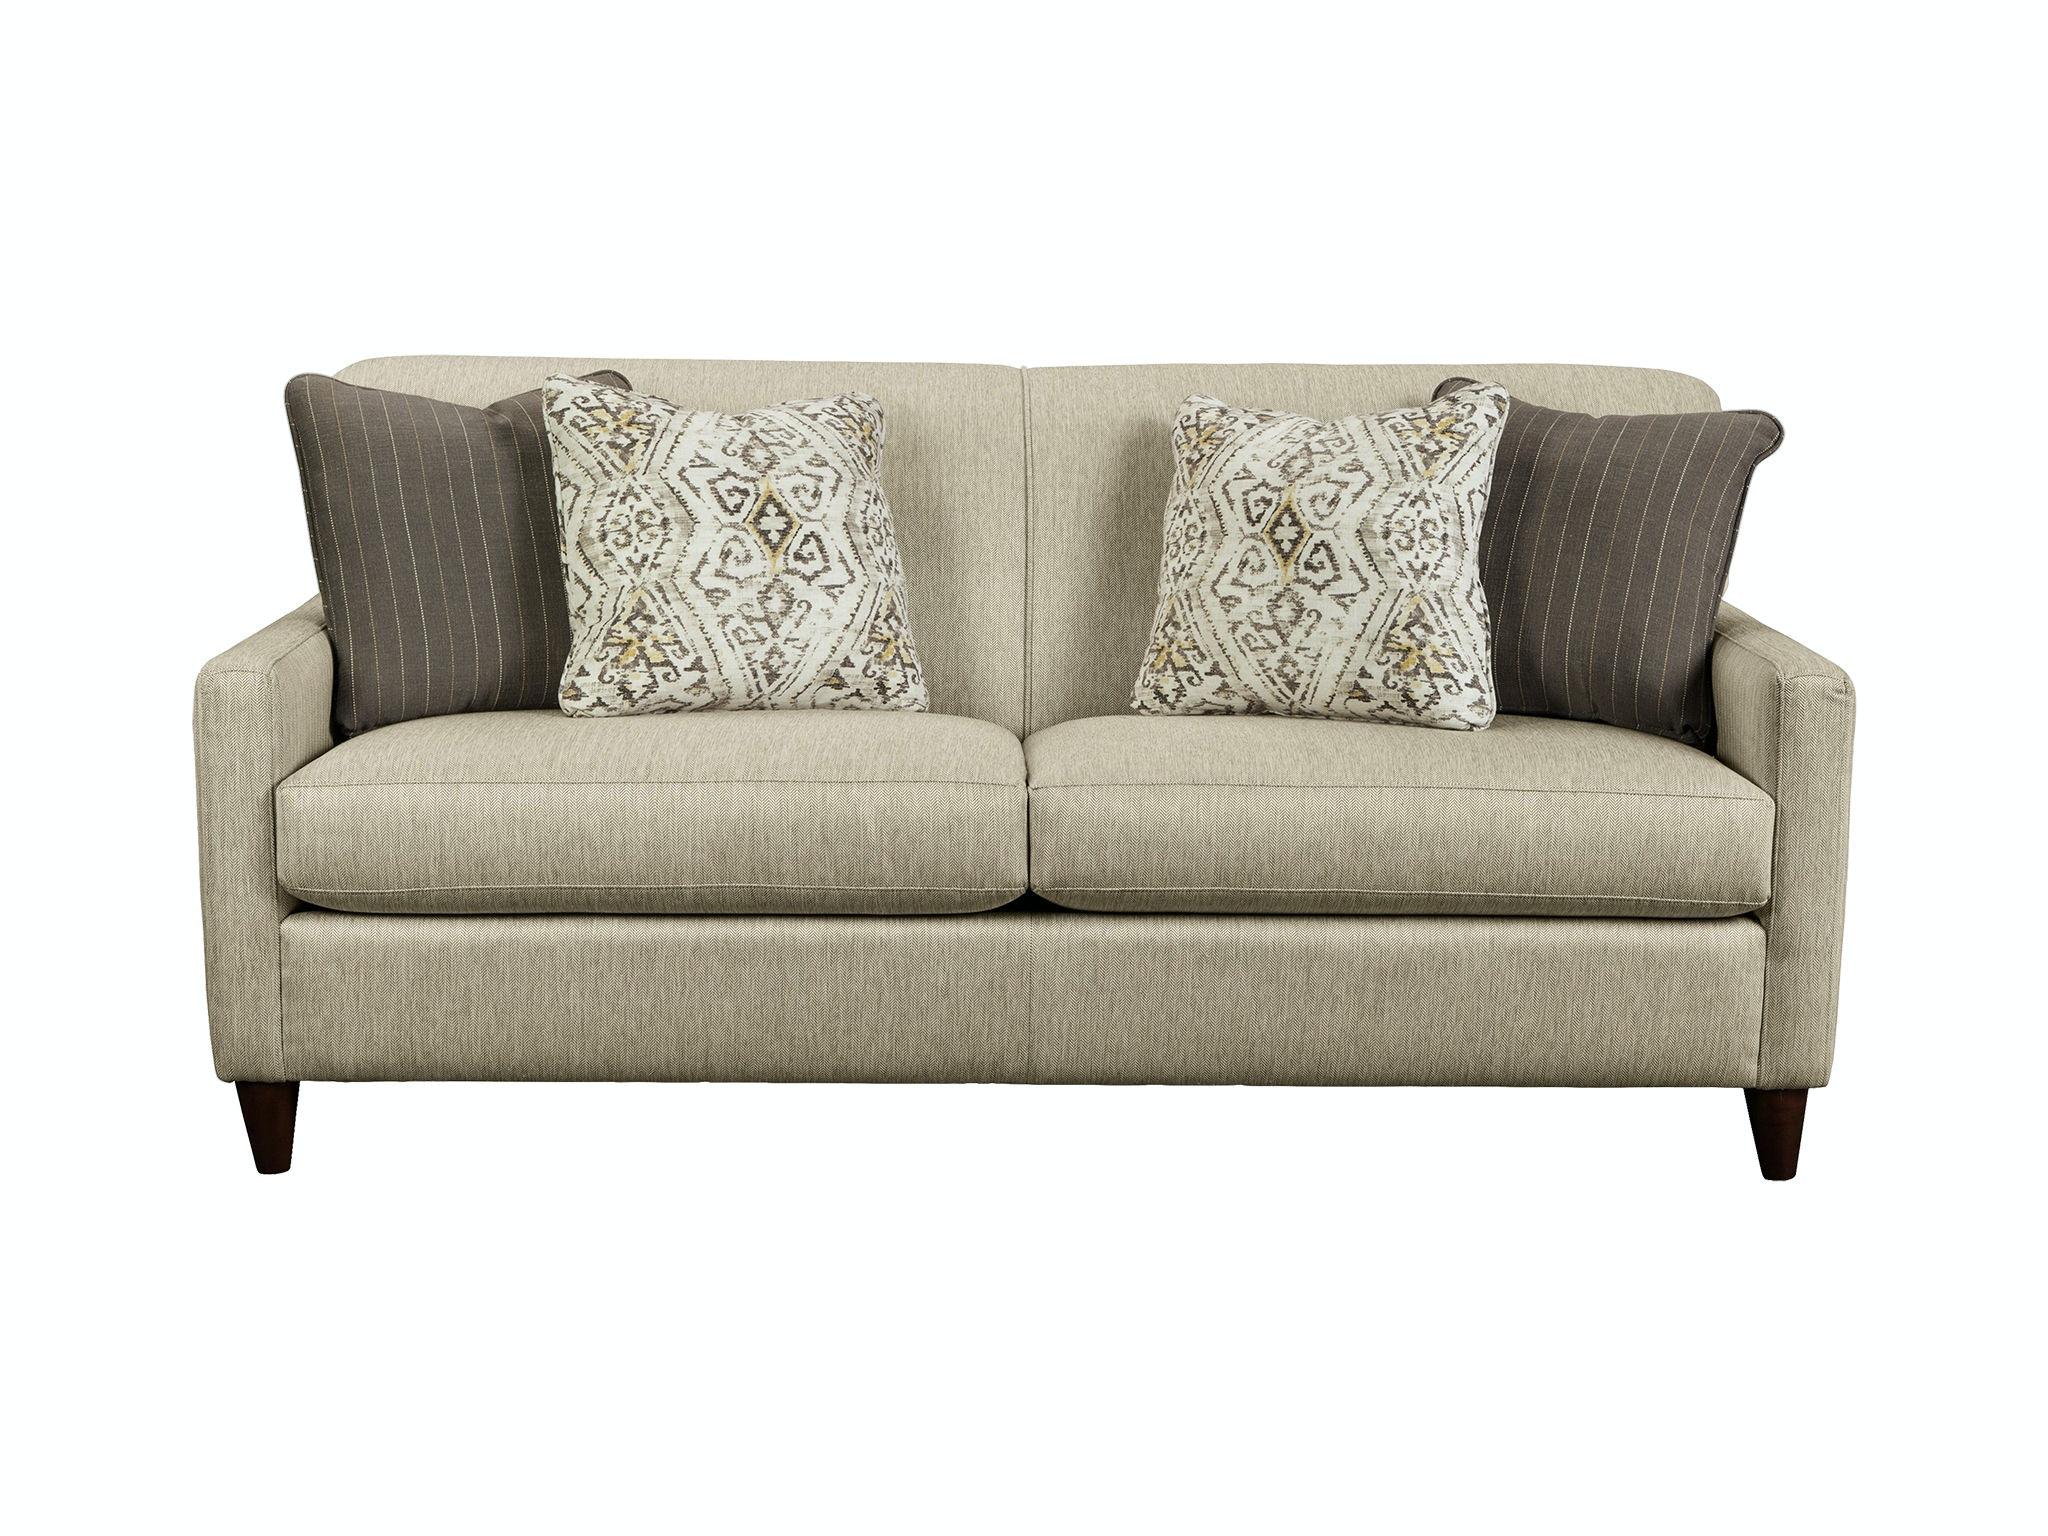 Craftmaster Living Room Sofa 770450   Watts Furniture Galleries   LaGrange,  GA